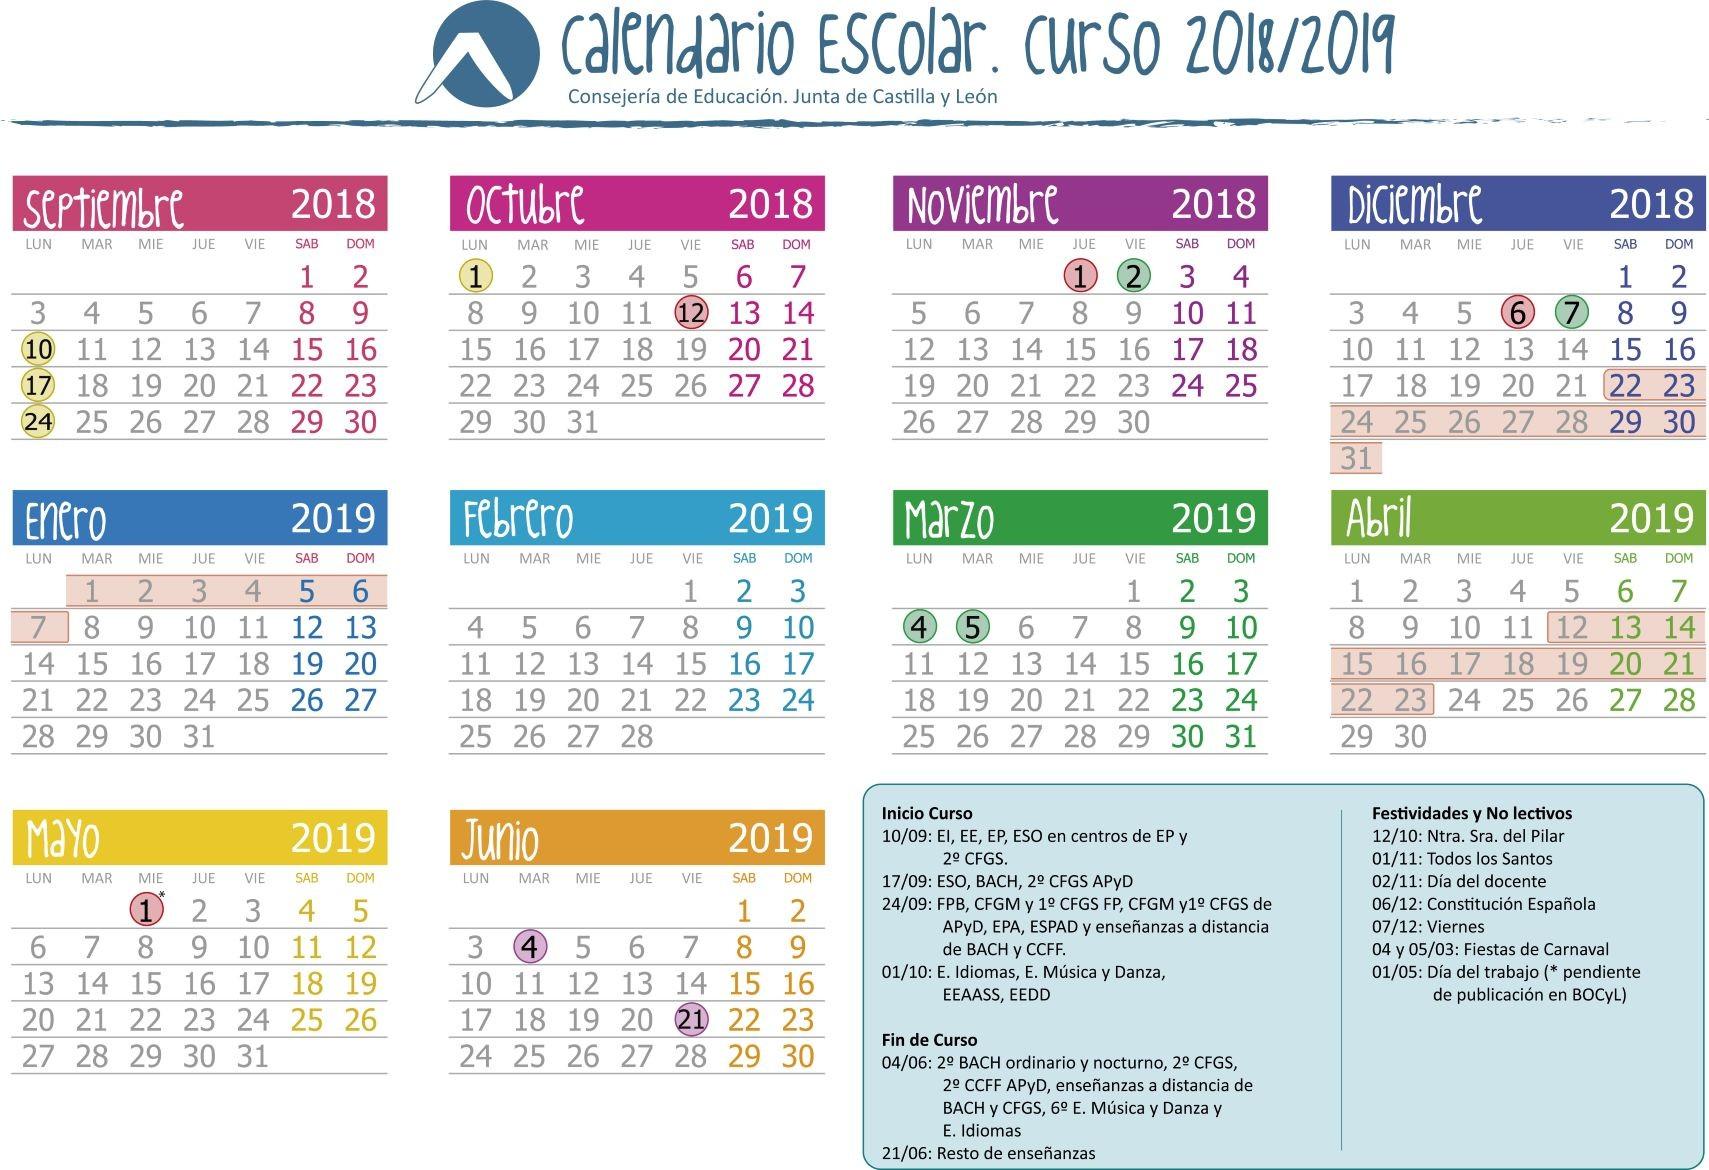 Calendario Escolar 2019 Mexico Con Dias Festivos Actual Ayer Te Vi Heredia Of Calendario Escolar 2019 Mexico Con Dias Festivos Más Arriba-a-fecha Calendario Ambiental